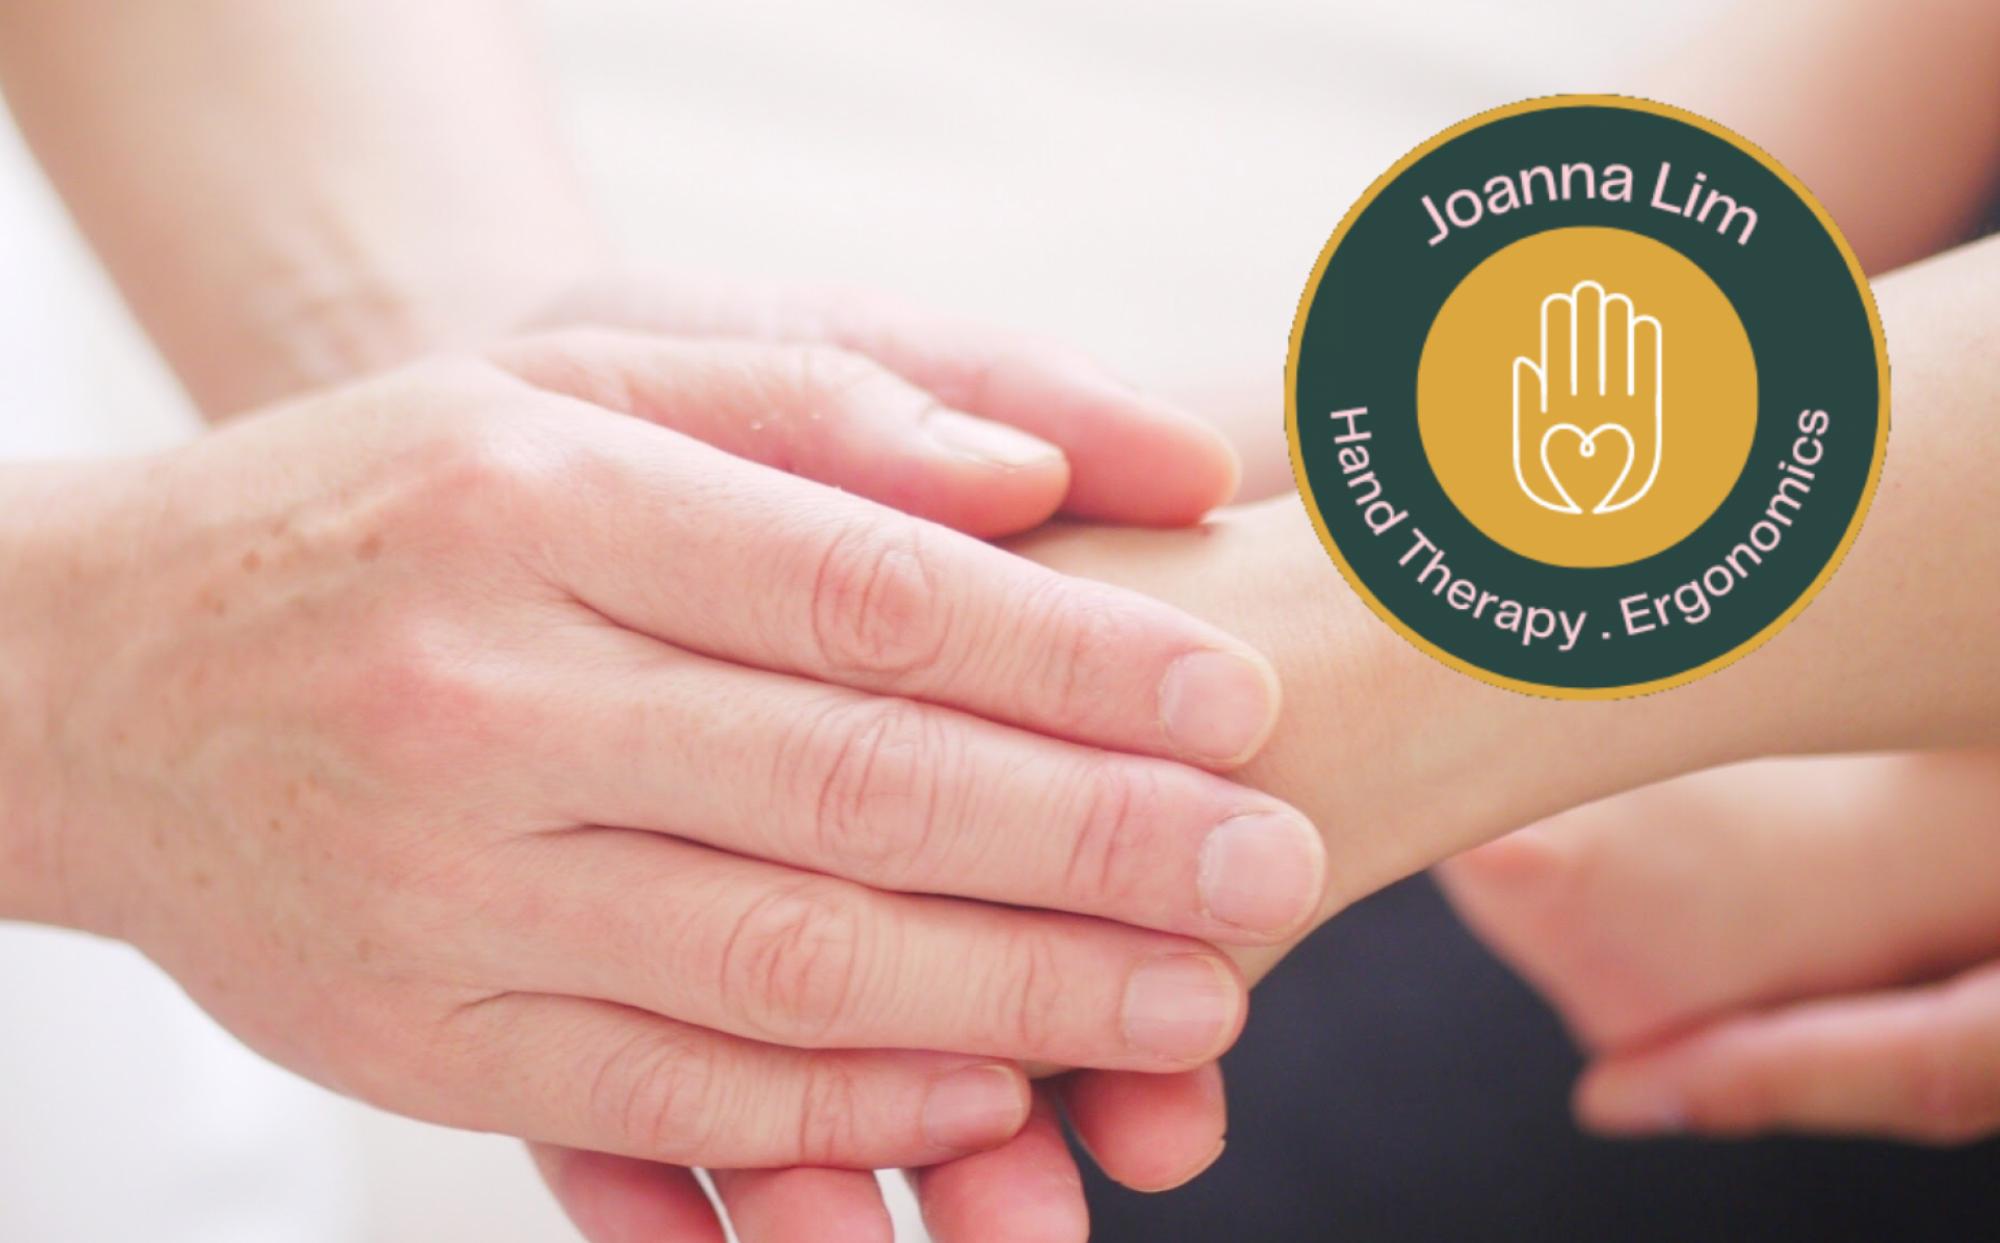 Hand Therapy & Ergonomics